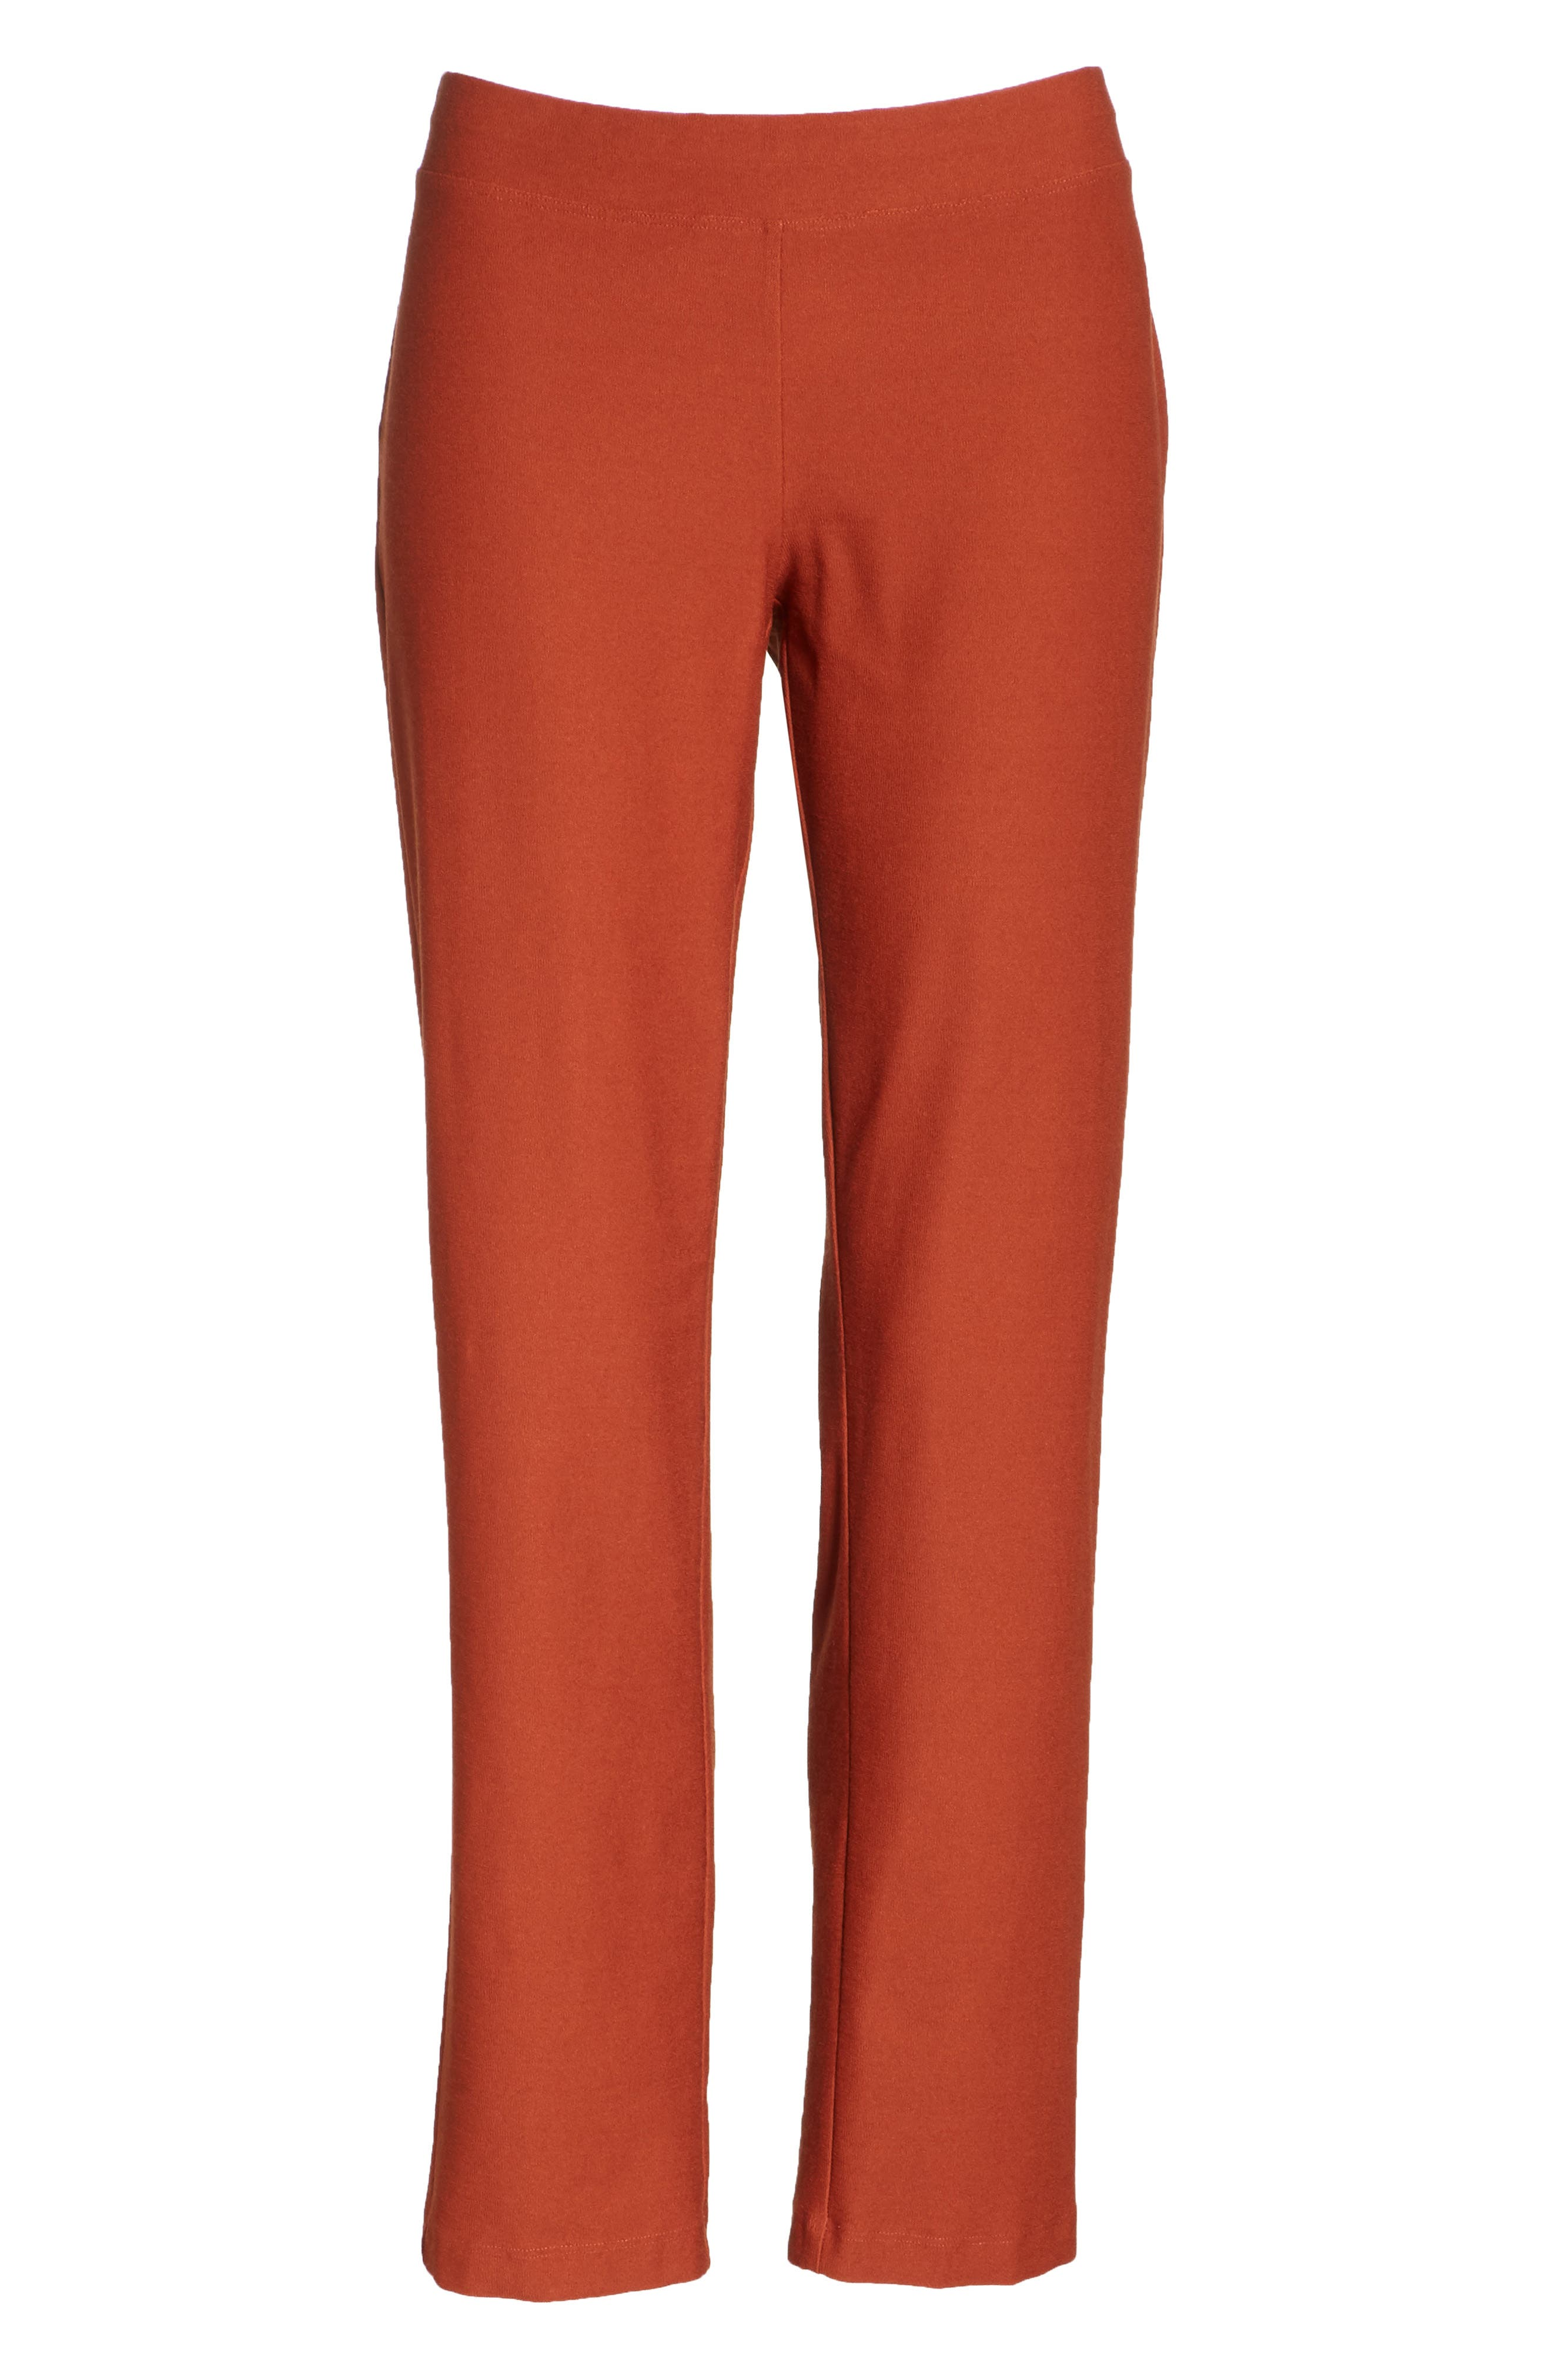 Stretch Crepe Slim Ankle Pants,                             Alternate thumbnail 7, color,                             Deep Pekoe